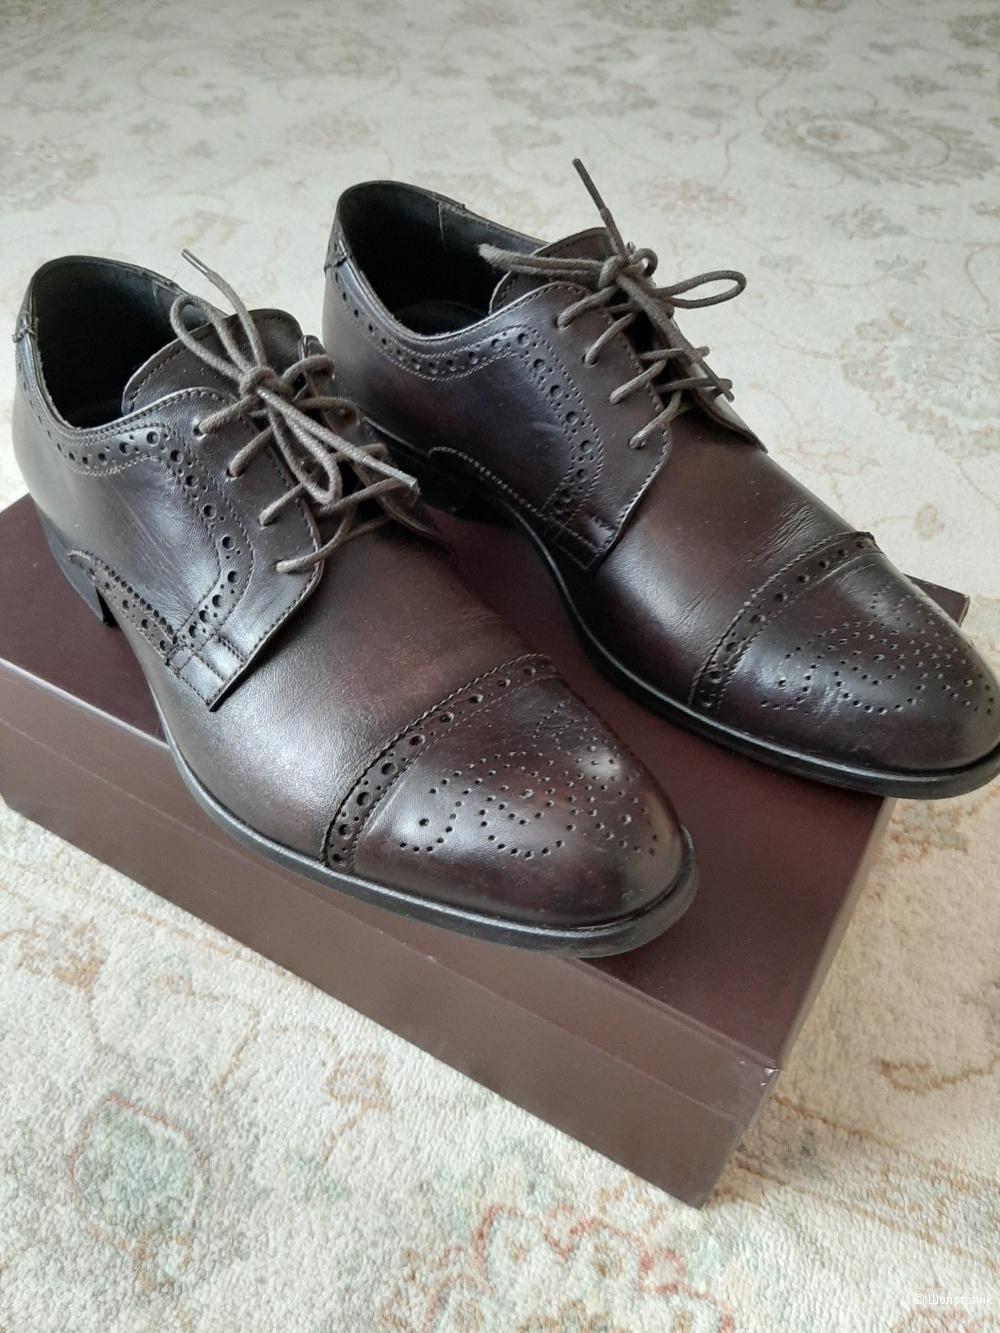 Ботинки Thompson, 41 размер (большемерят)